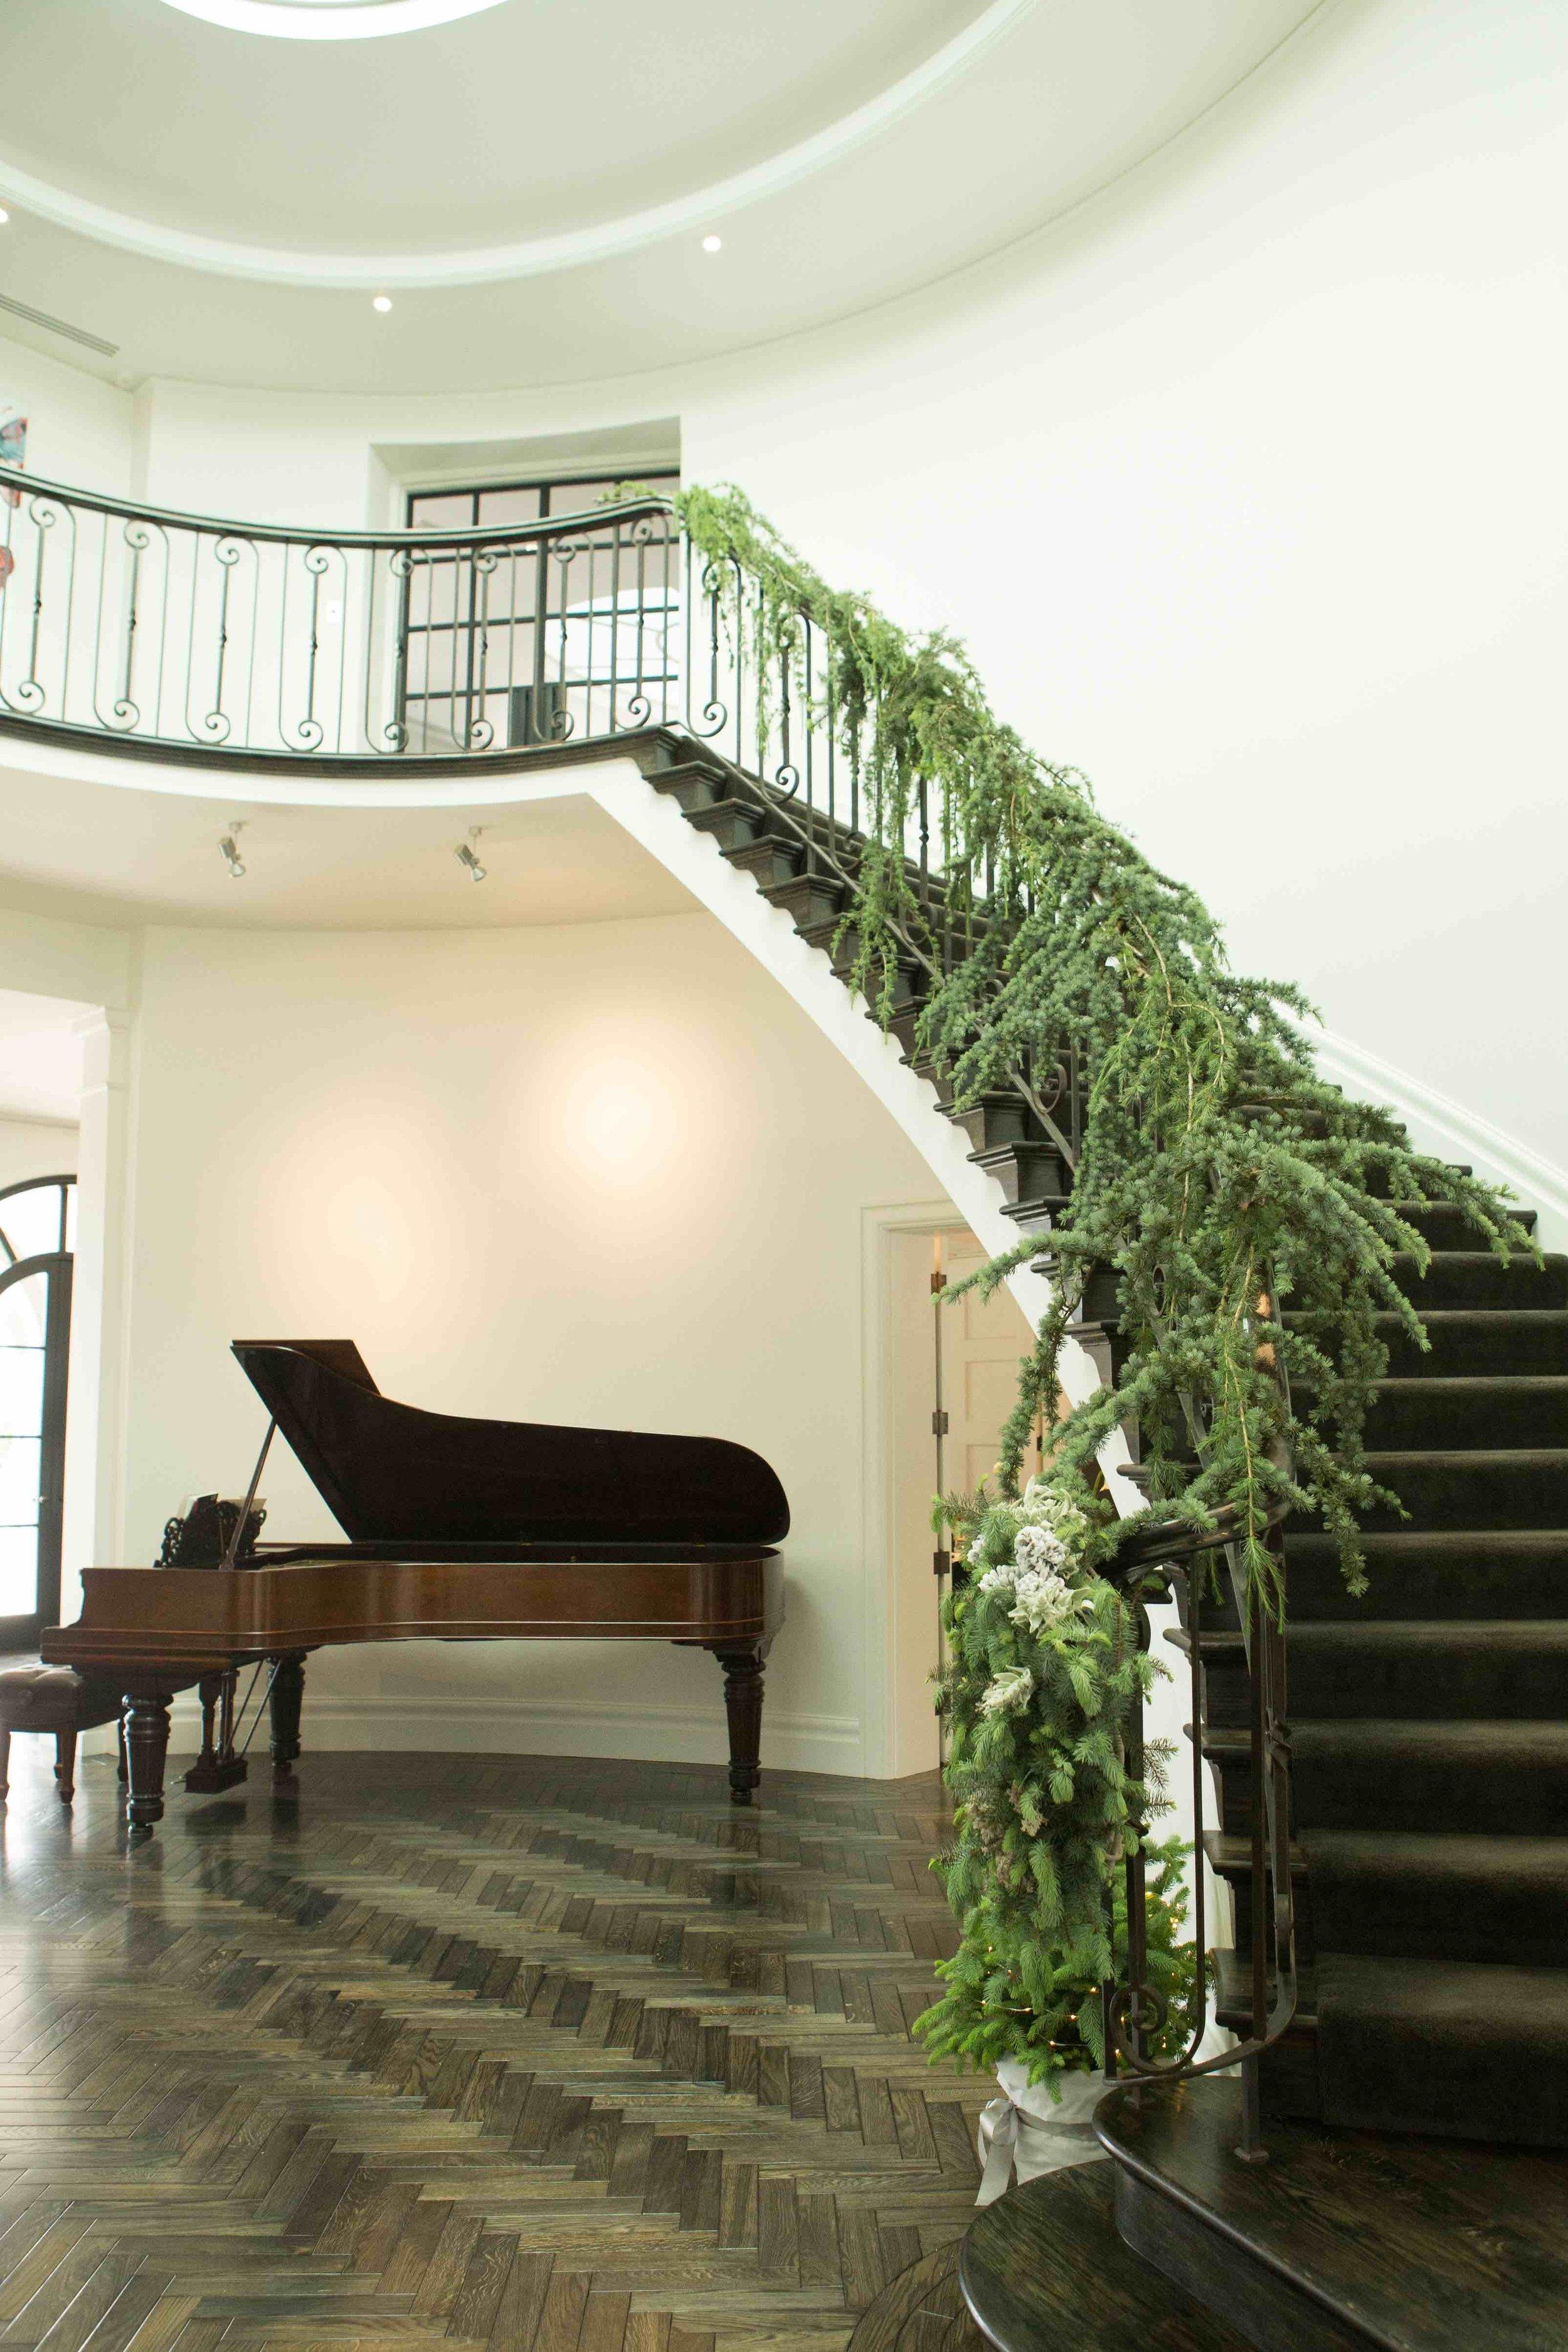 georg-jensen-by-heemskerk-stairs-decor.jpeg